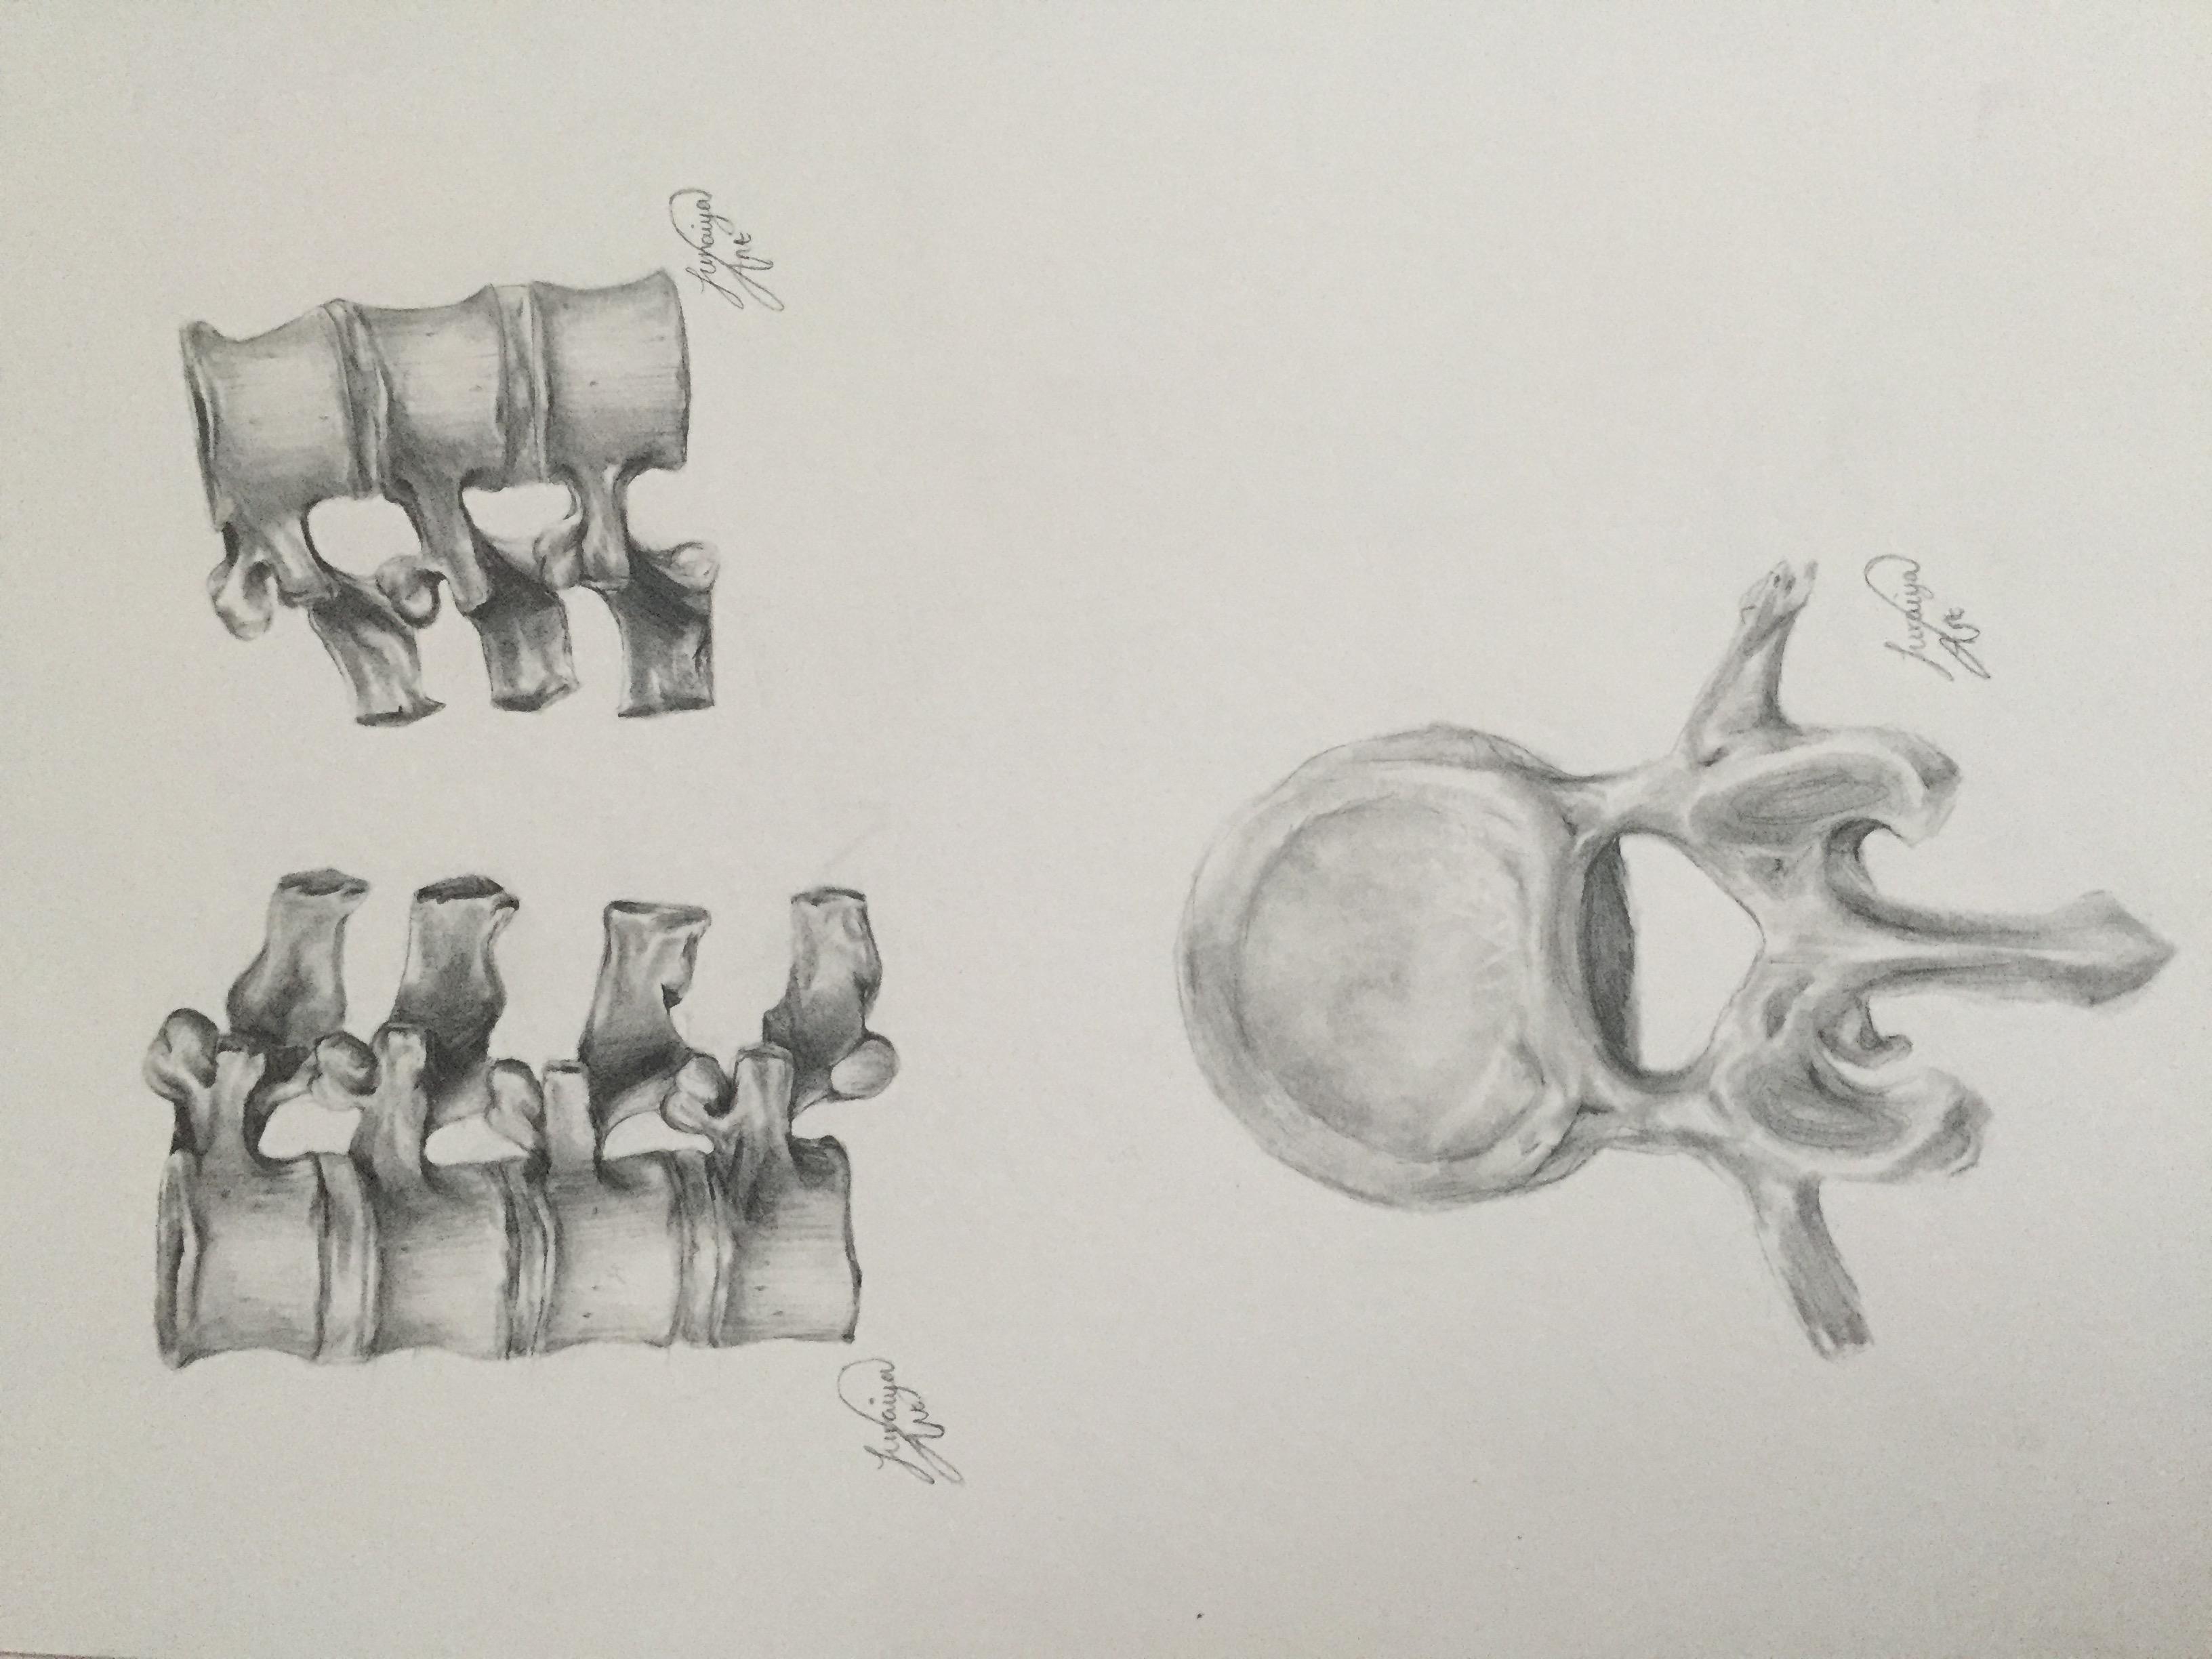 Anatomical Illustration for Journal